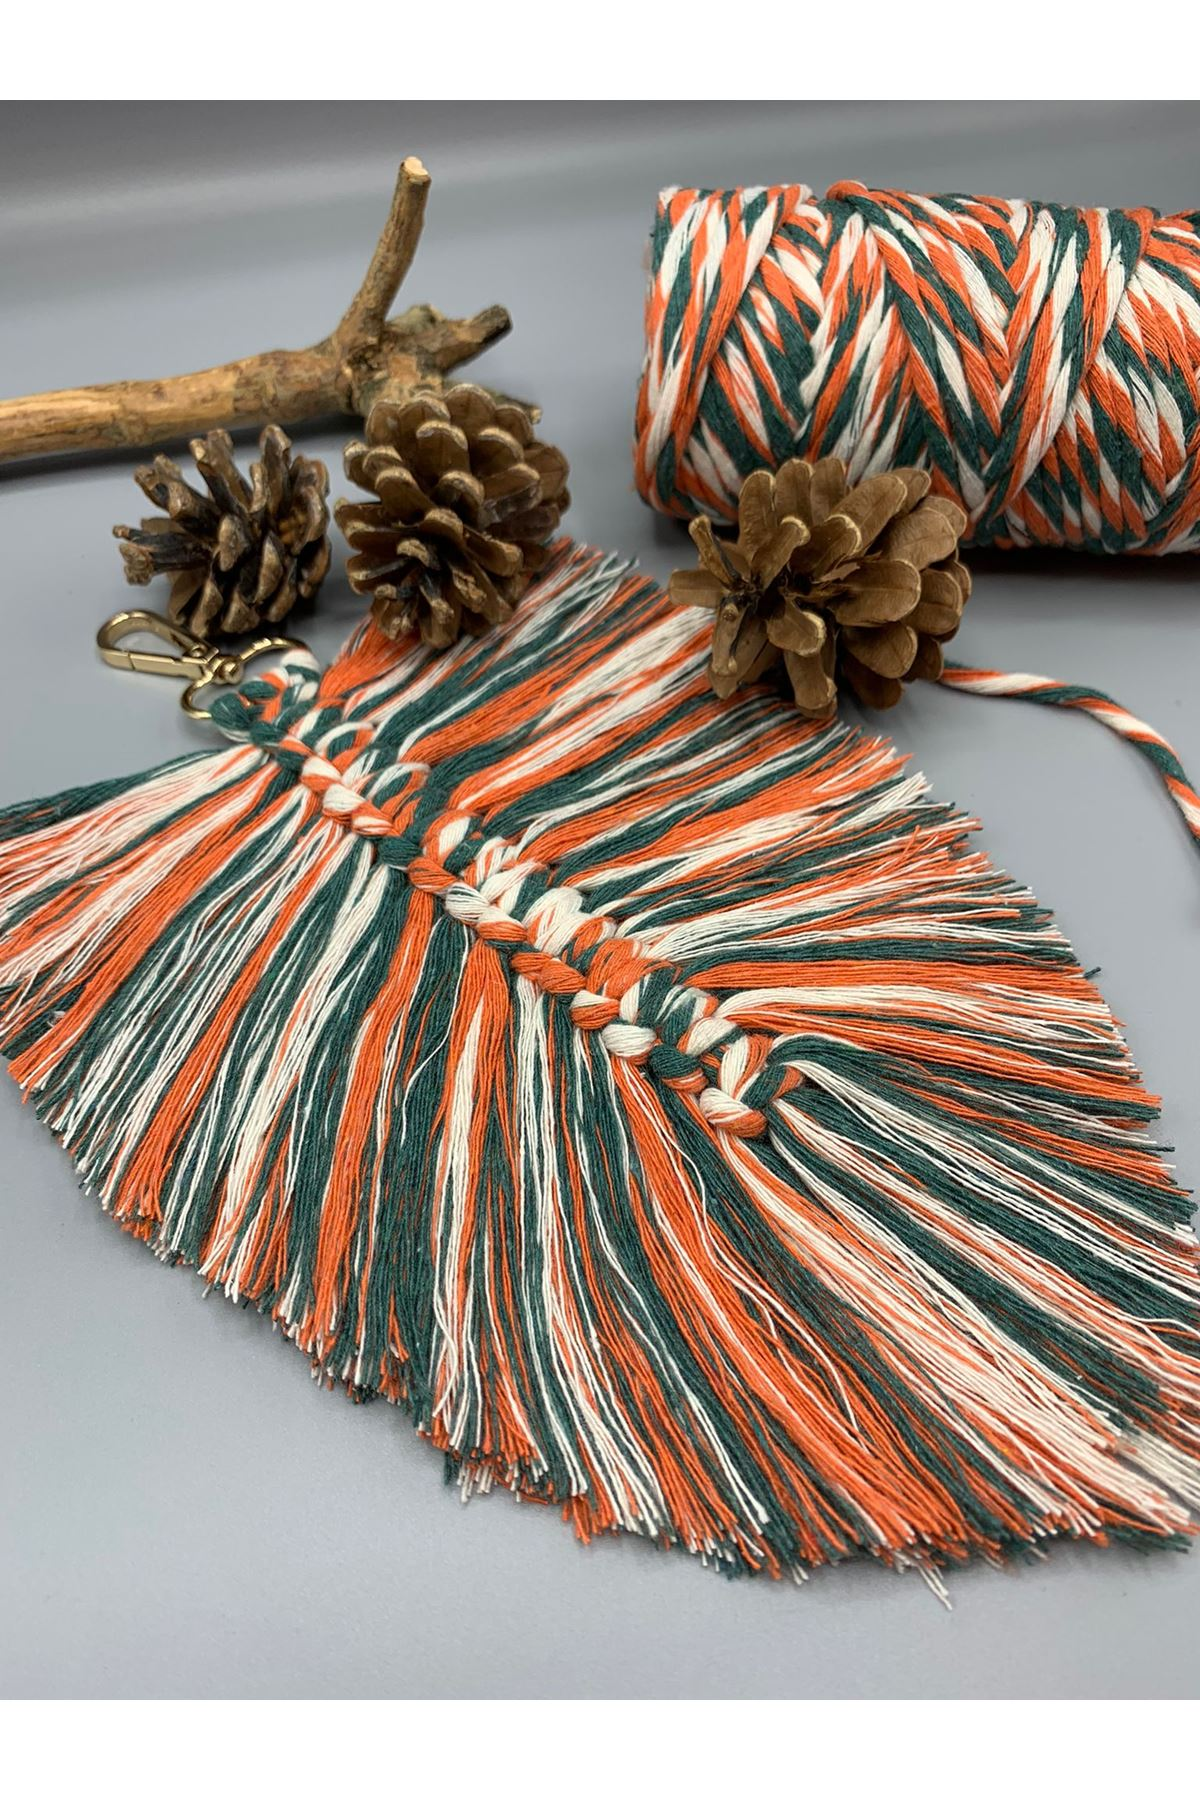 Tarama Makrome Colored 5 mm - 10